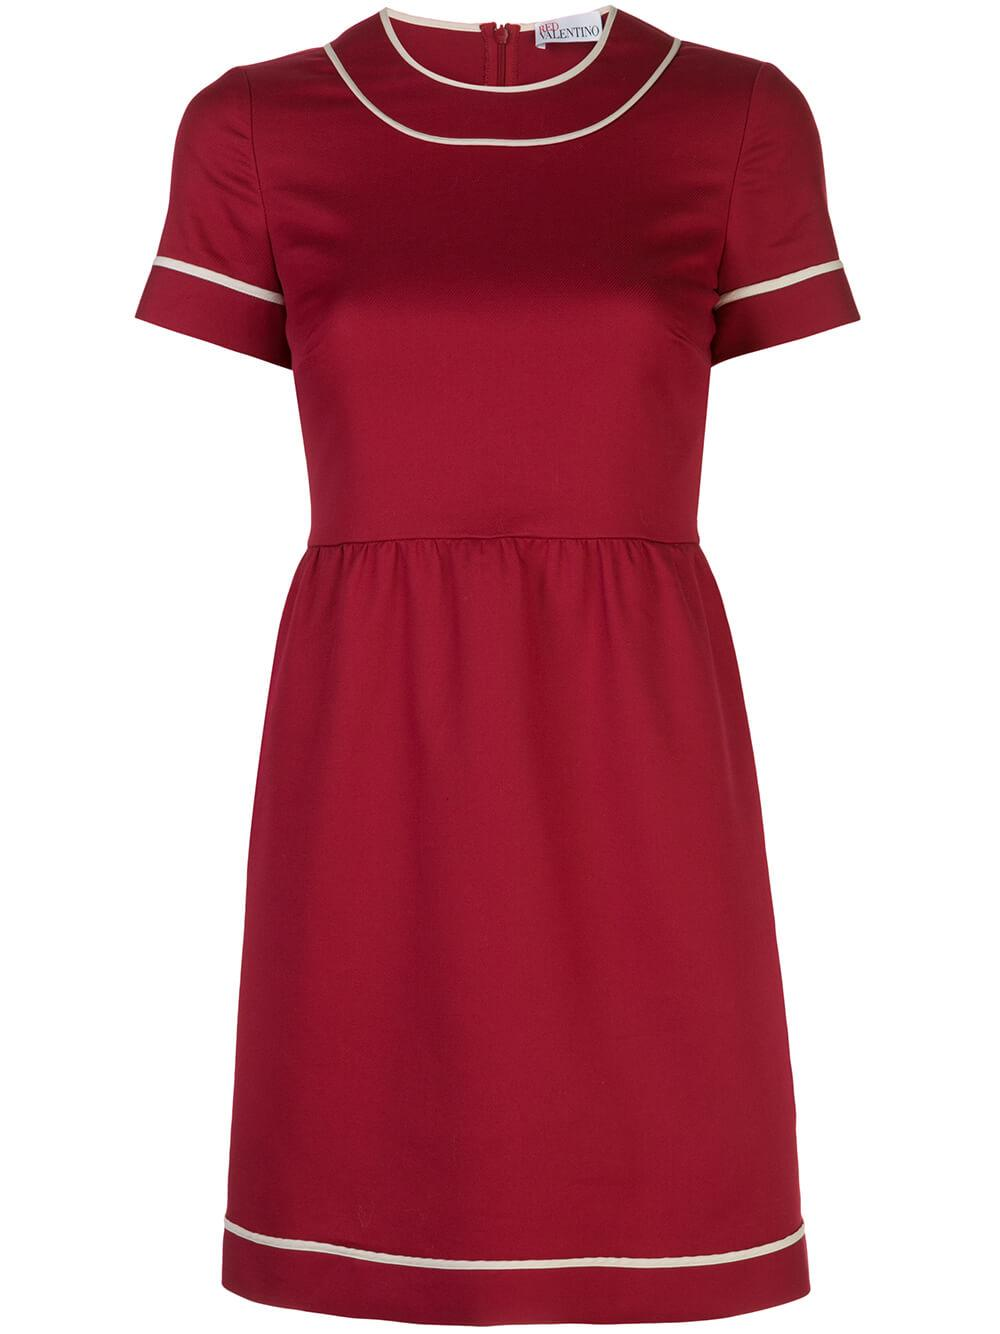 Short Sleeve Cotton Dady Short Dress Item # TR3VAM103M7